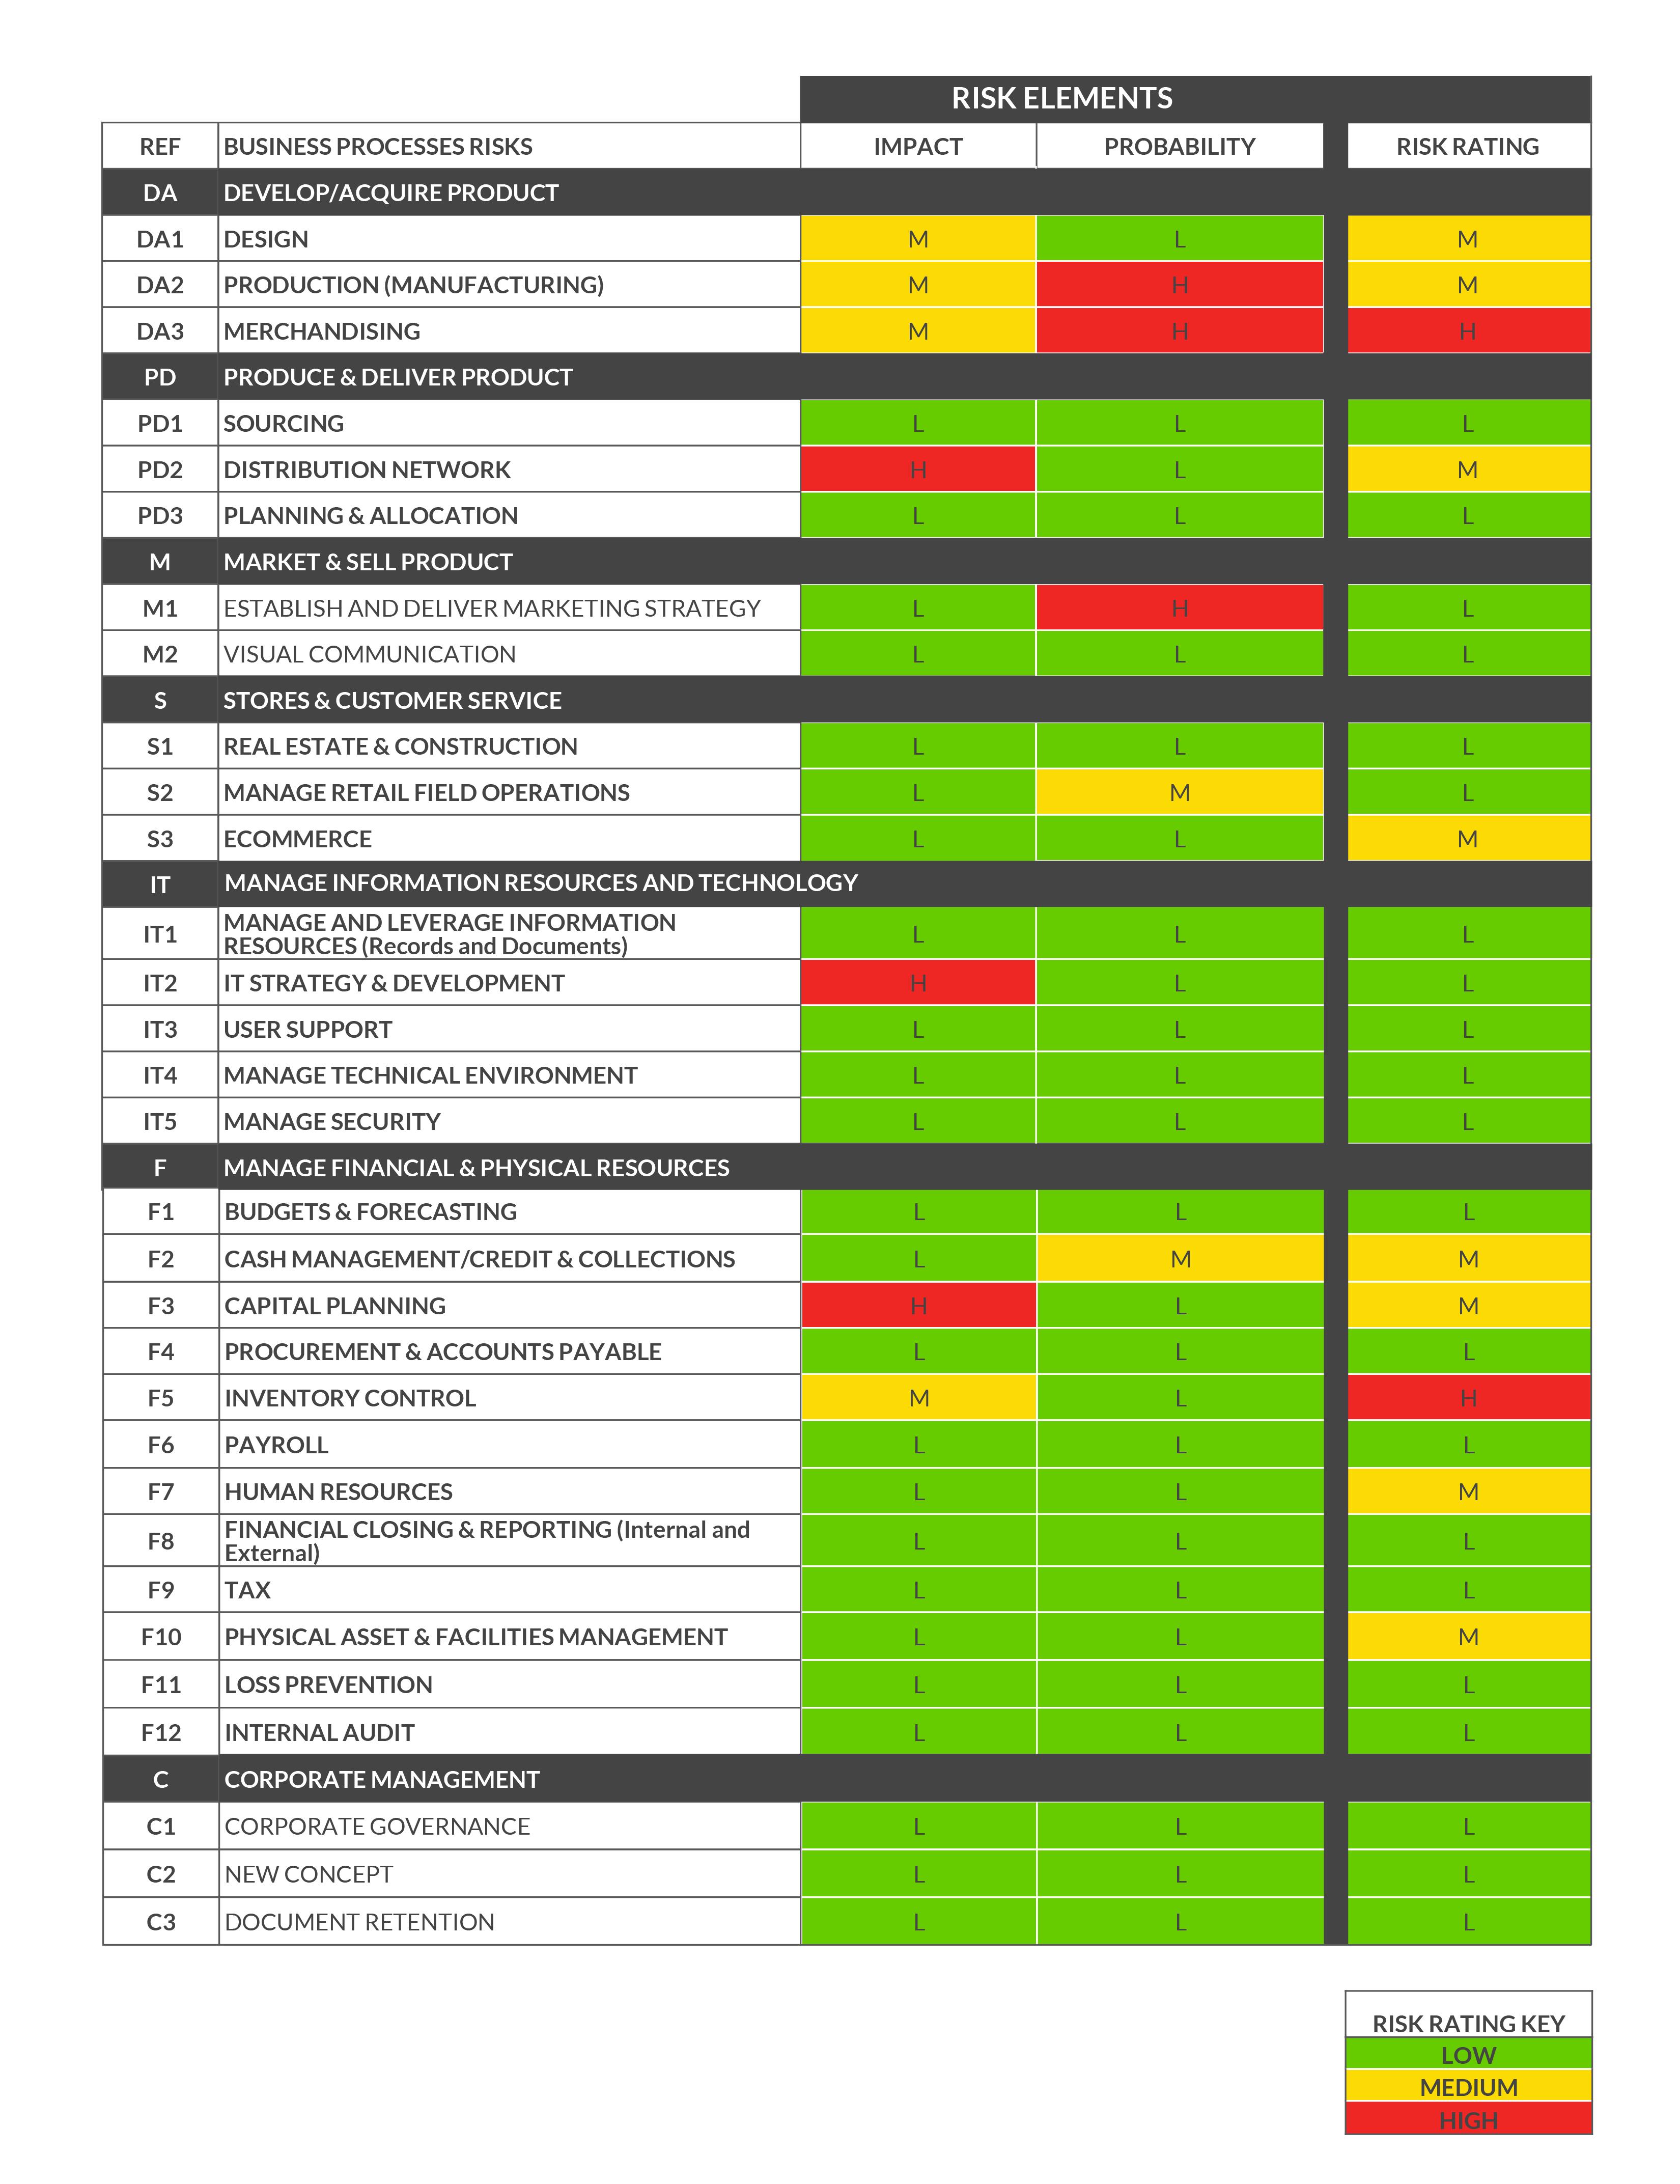 19 Awesome Risk Management Process Flow Diagram Design